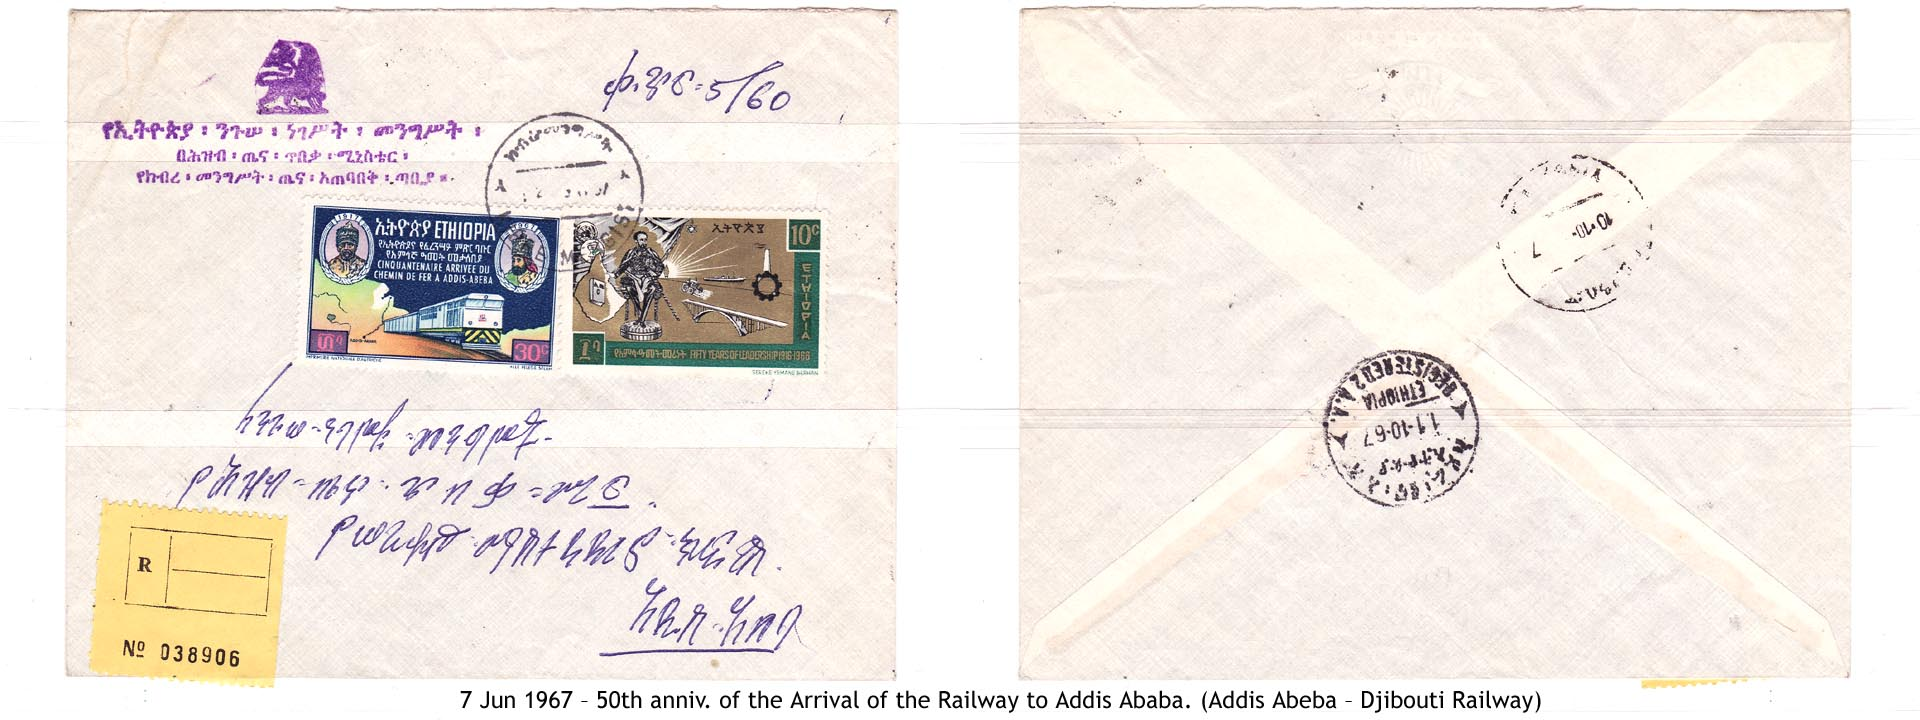 19670607 – 50th anniv. of the Arrival of the Railway to Addis Ababa. (Addis Abeba – Djibouti Railway)